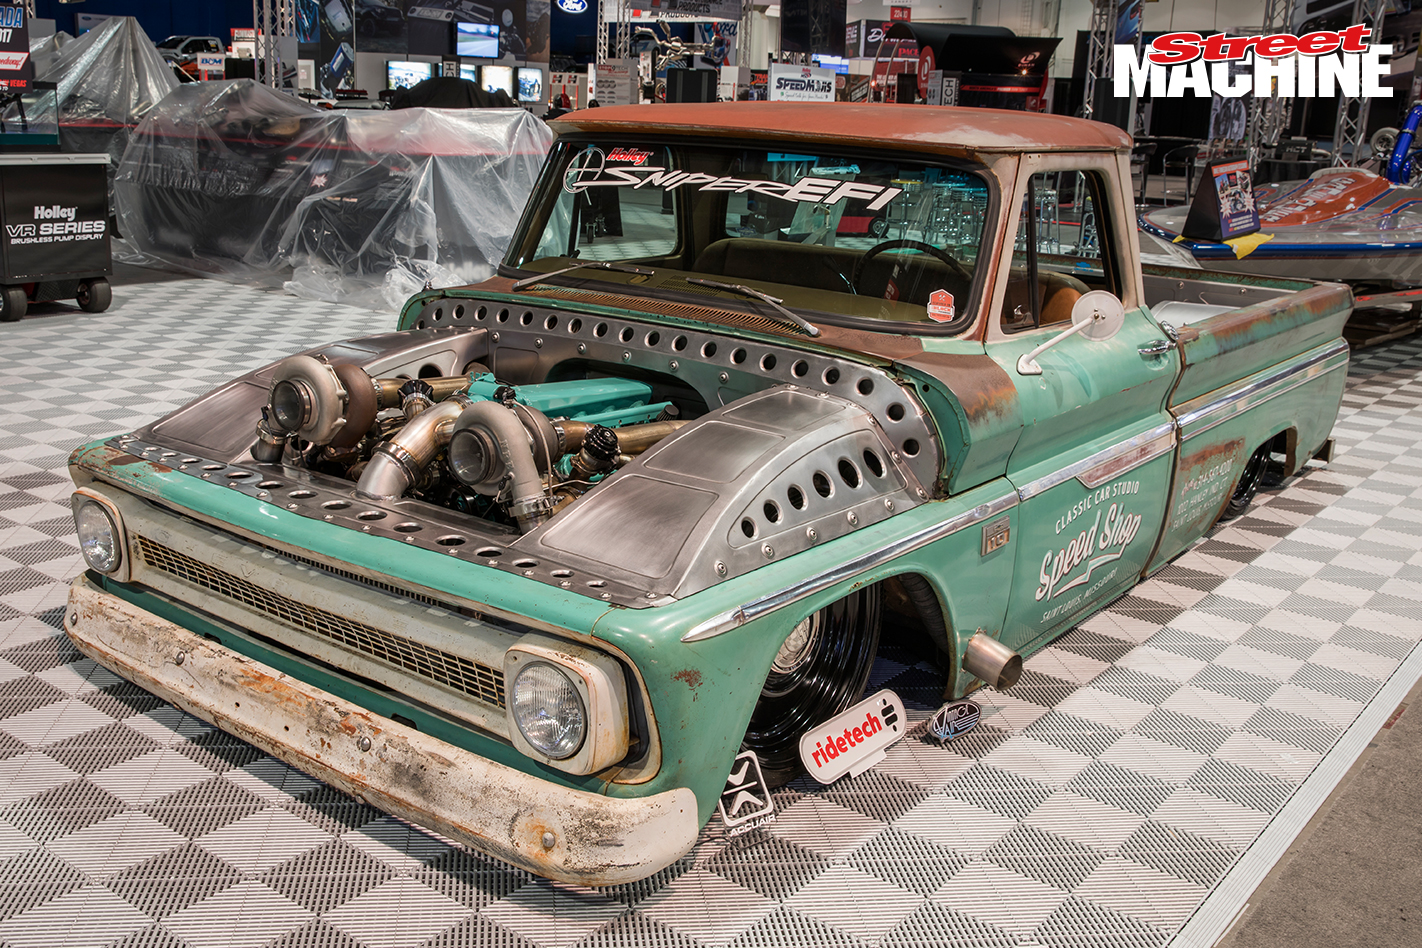 Twin Turbo Shop Truck SEMA